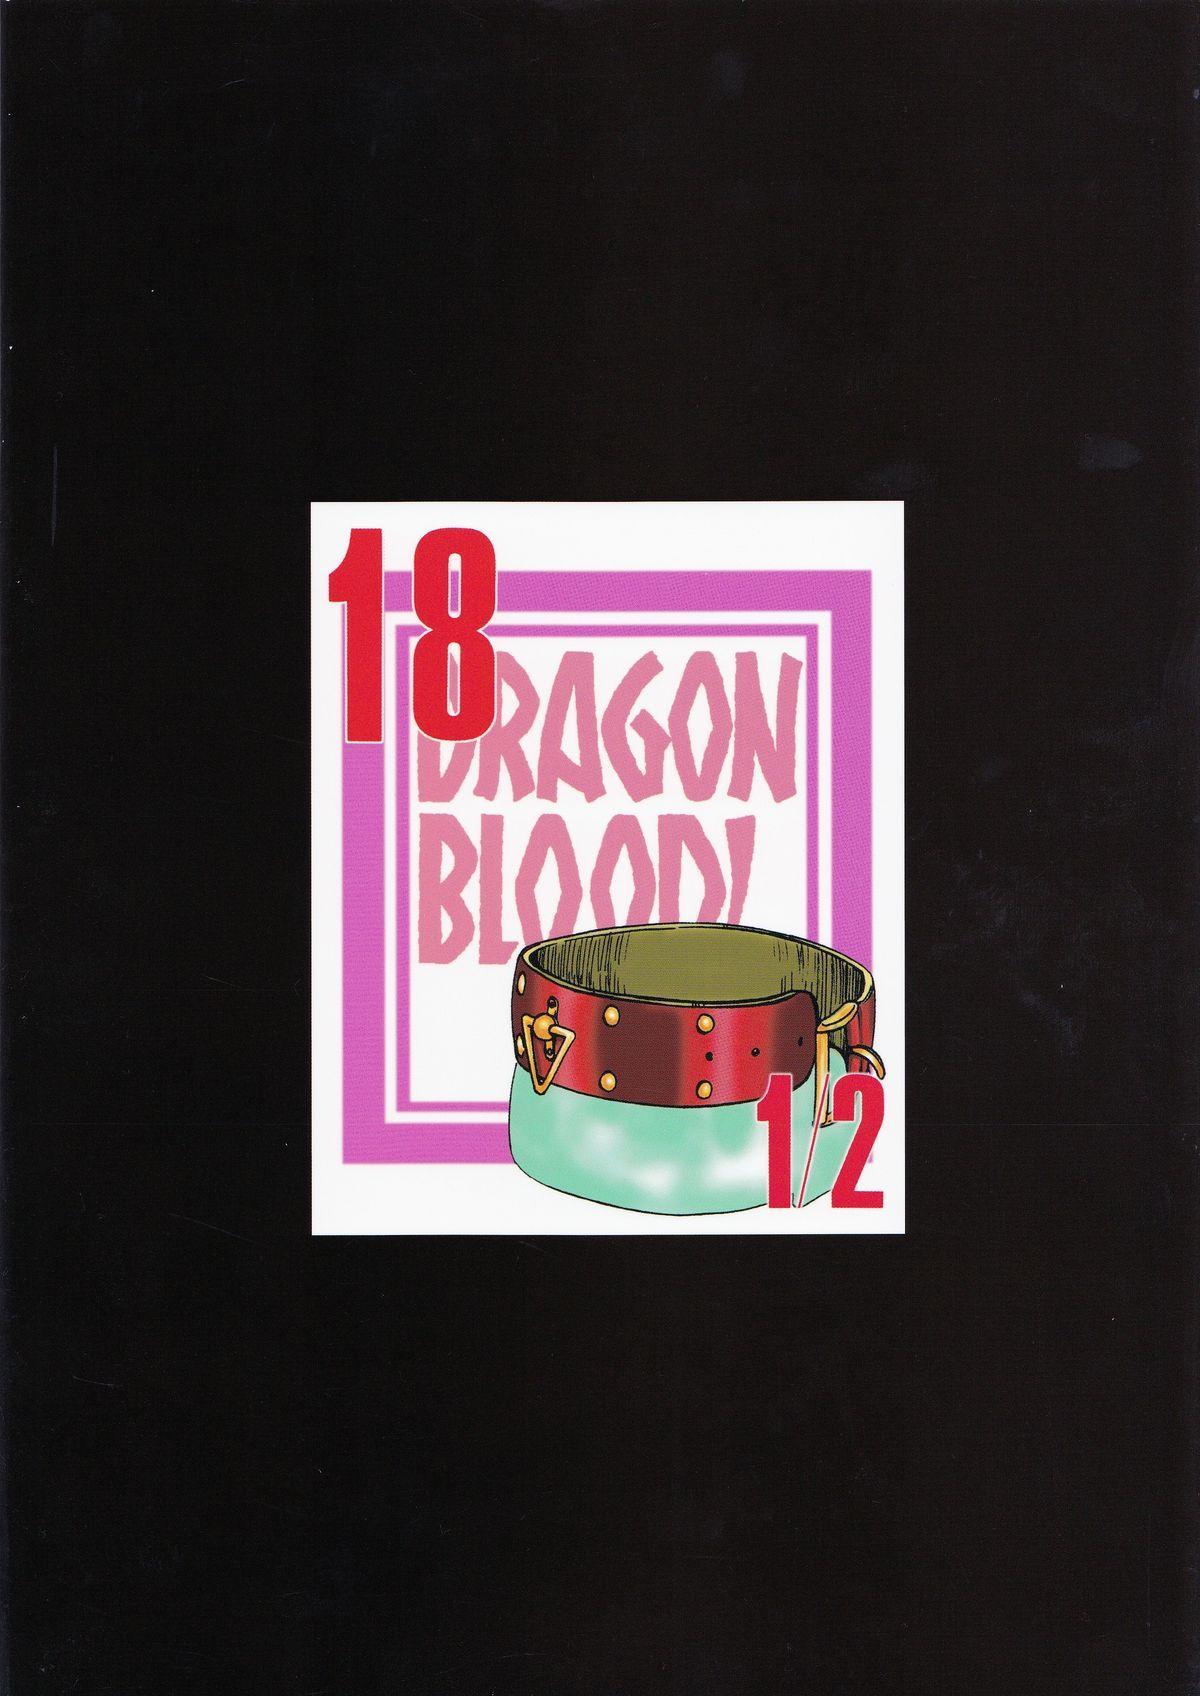 Nise DRAGON BLOOD! 18 1/2 1